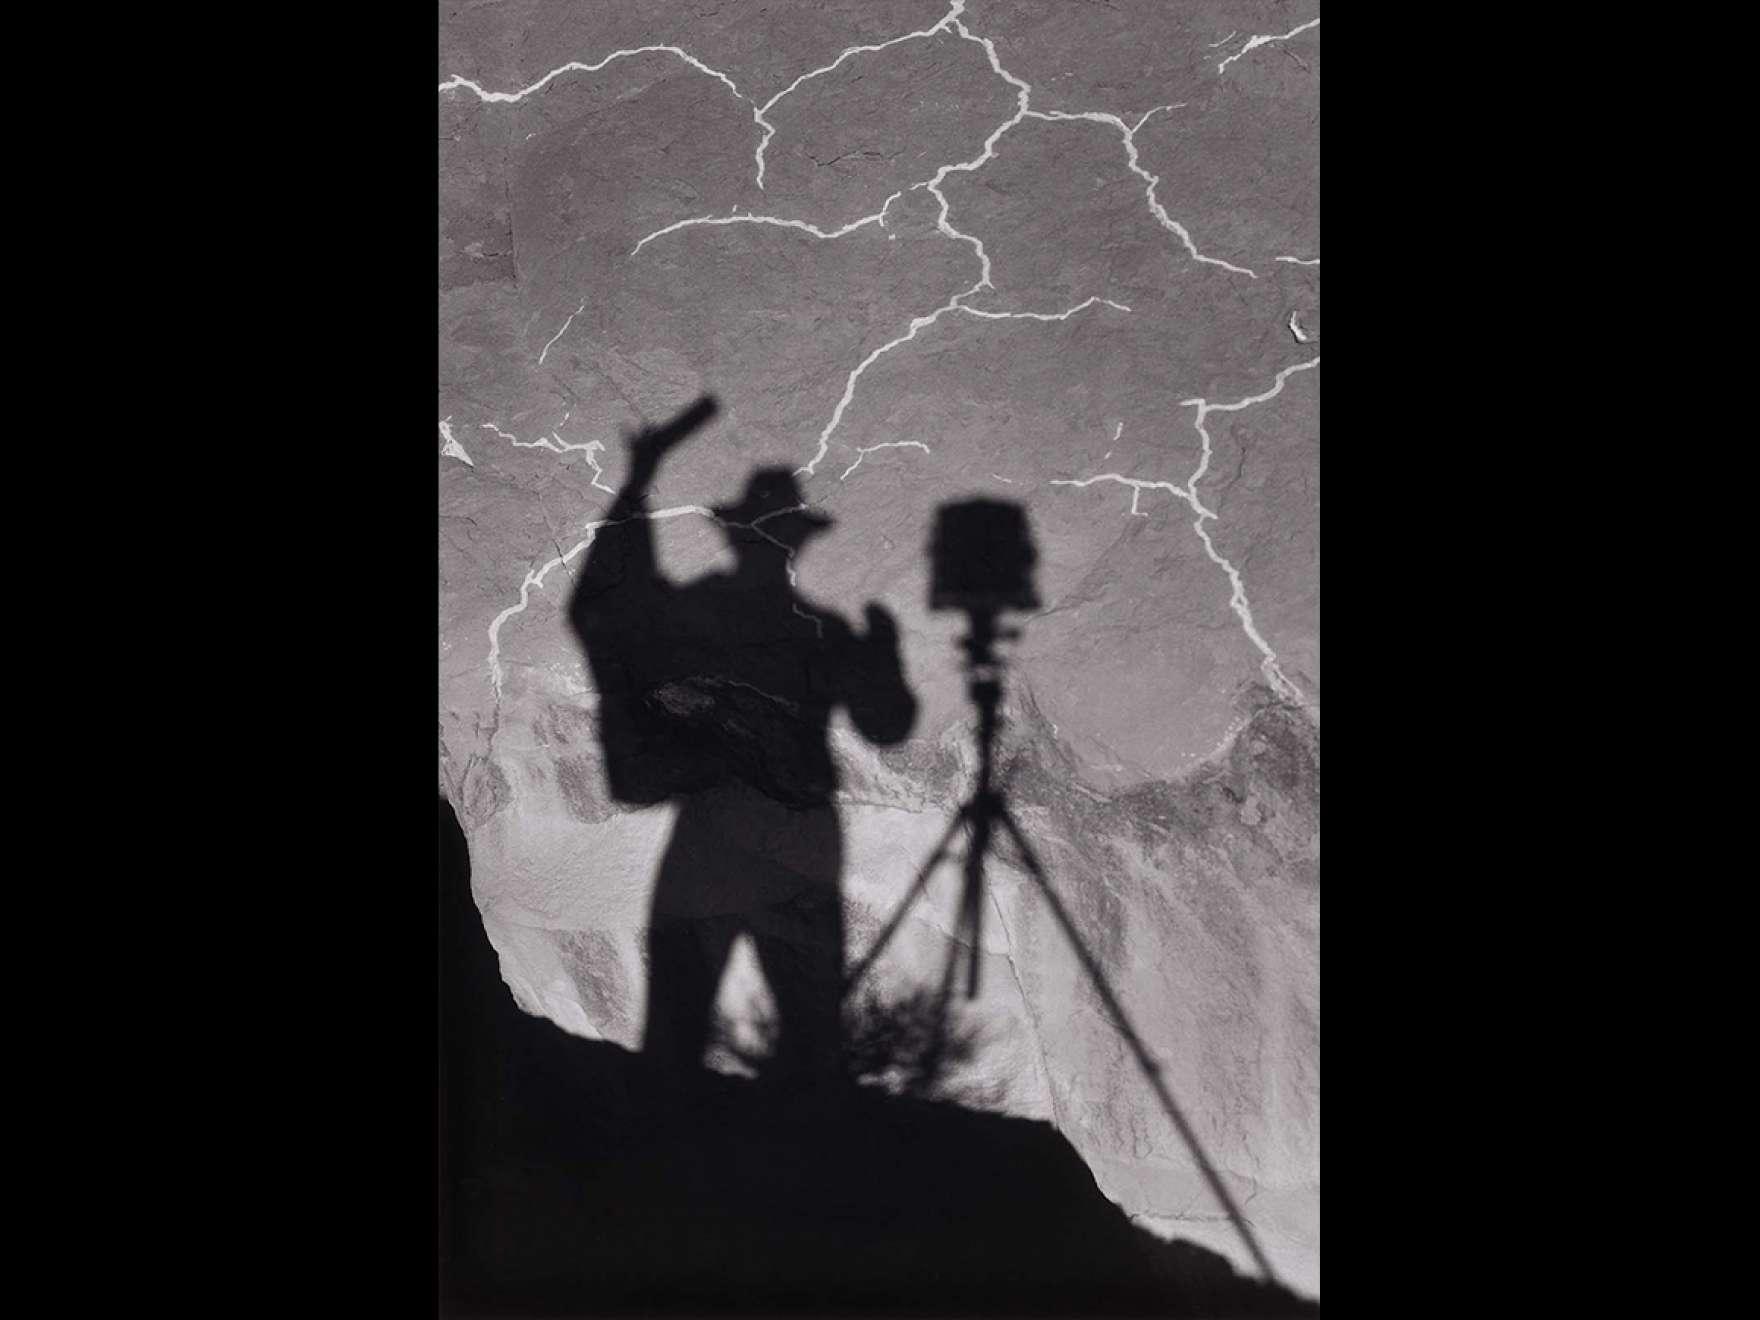 Ansel Adams' photograph, Self-Portrait, Monument Valley, Utah